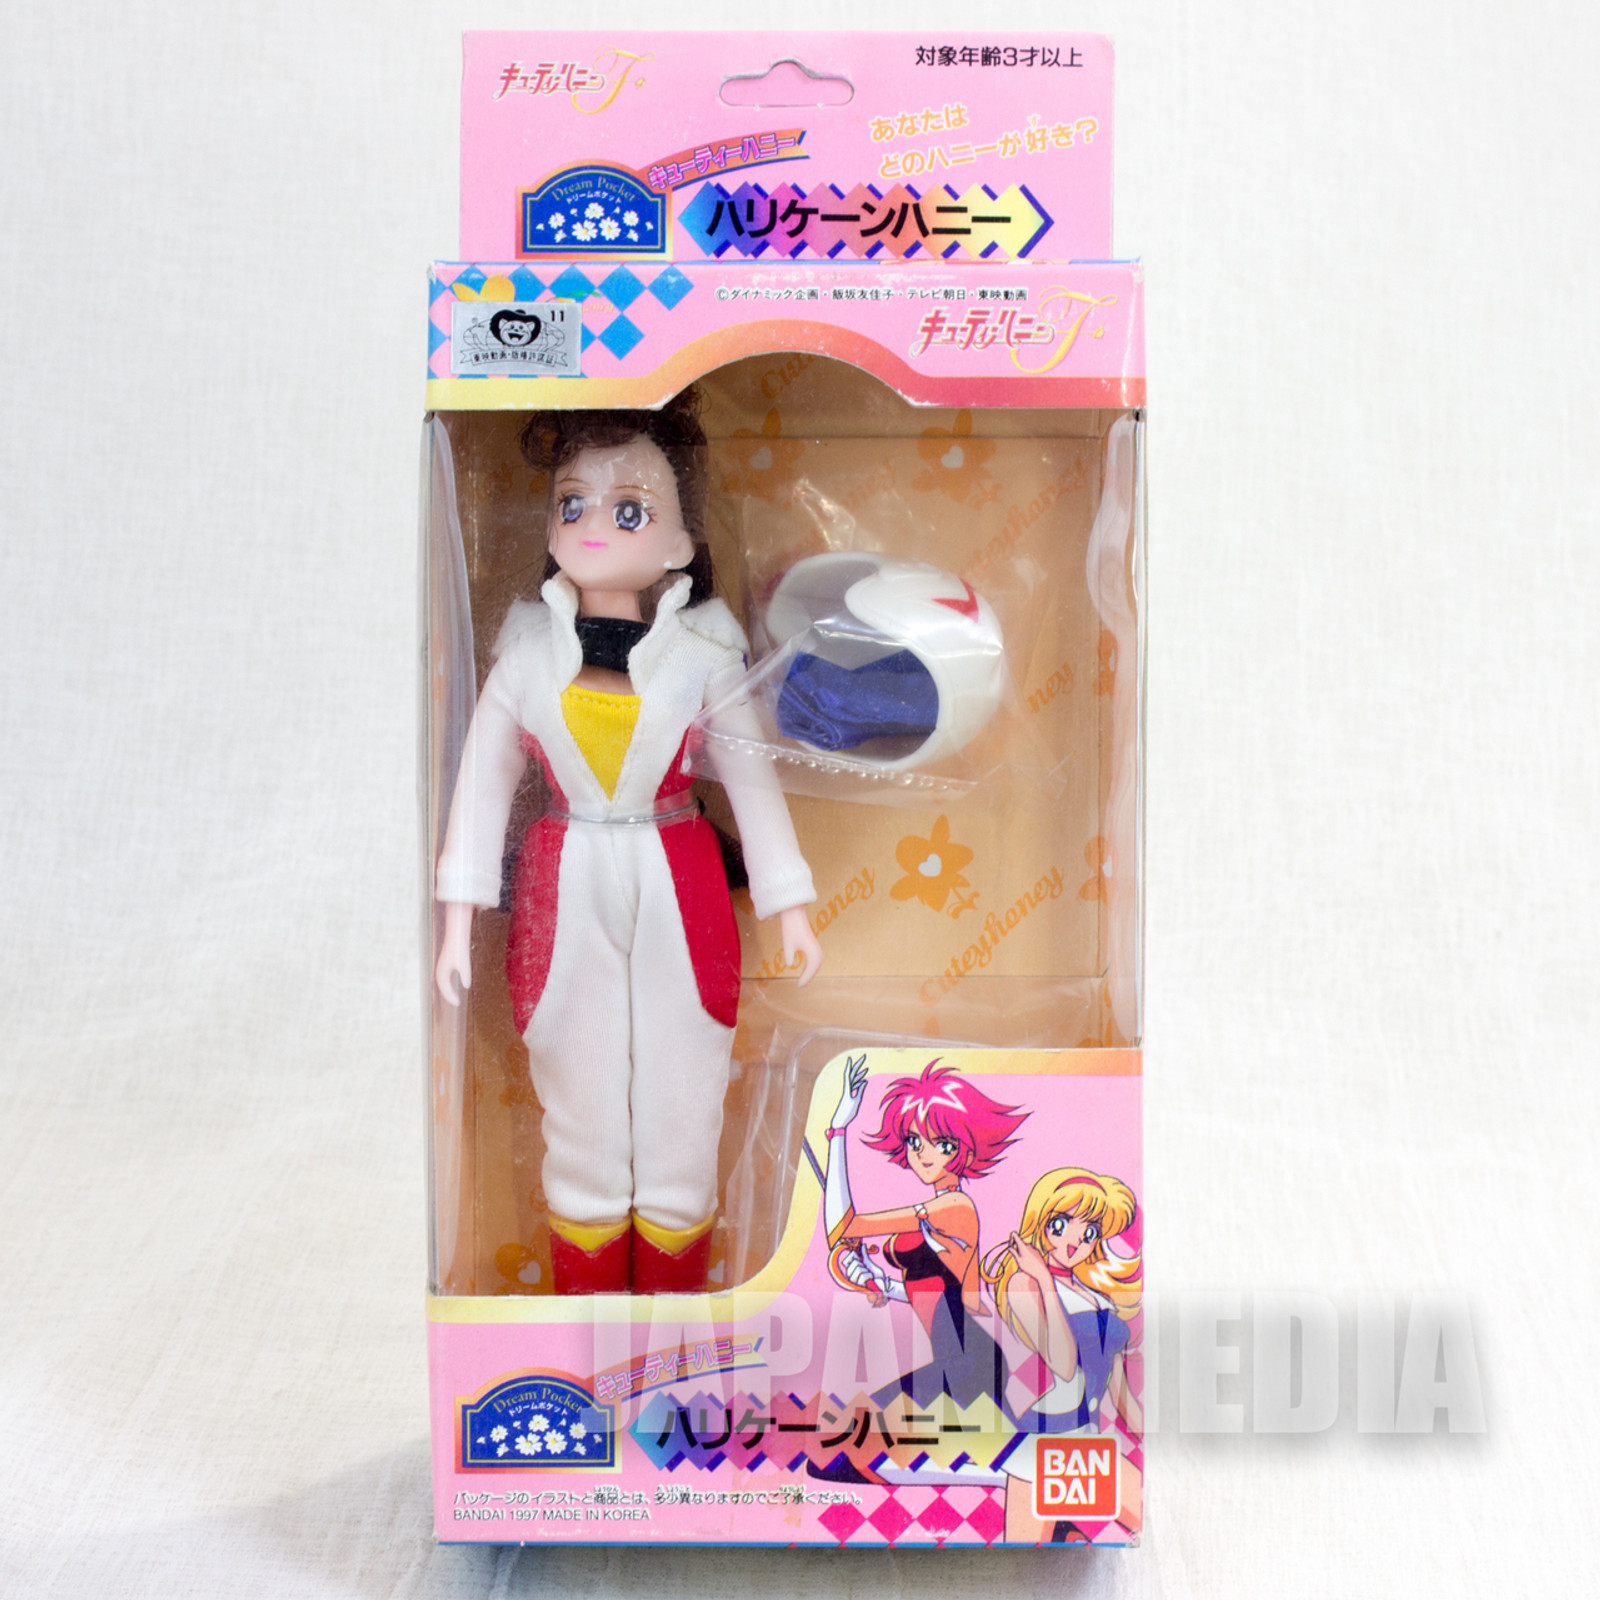 Cutie Honey Doll Figure Hurricane ver. Dream Pocket BANDAI JAPAN ANIME MANGA